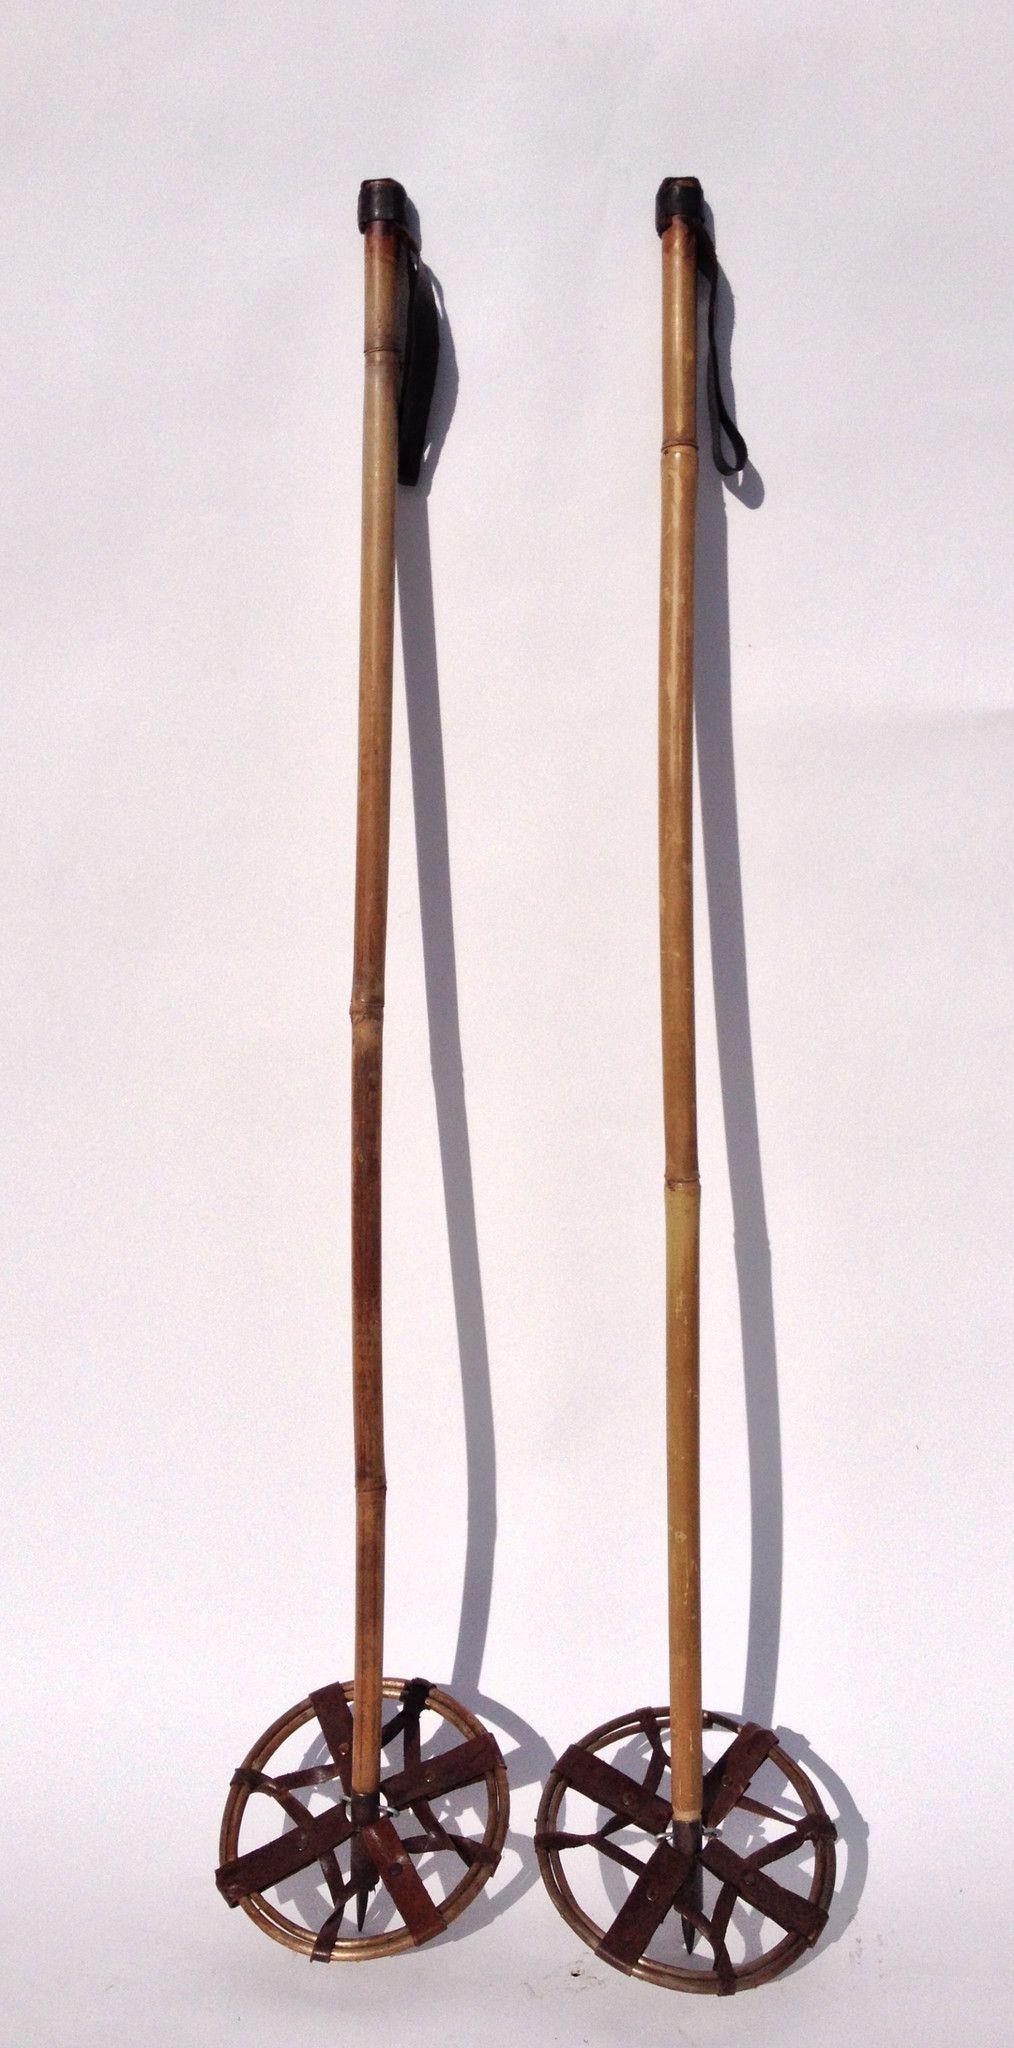 Bamboo Ski Poles Leather Grips Vintage Skis Leather Skiing